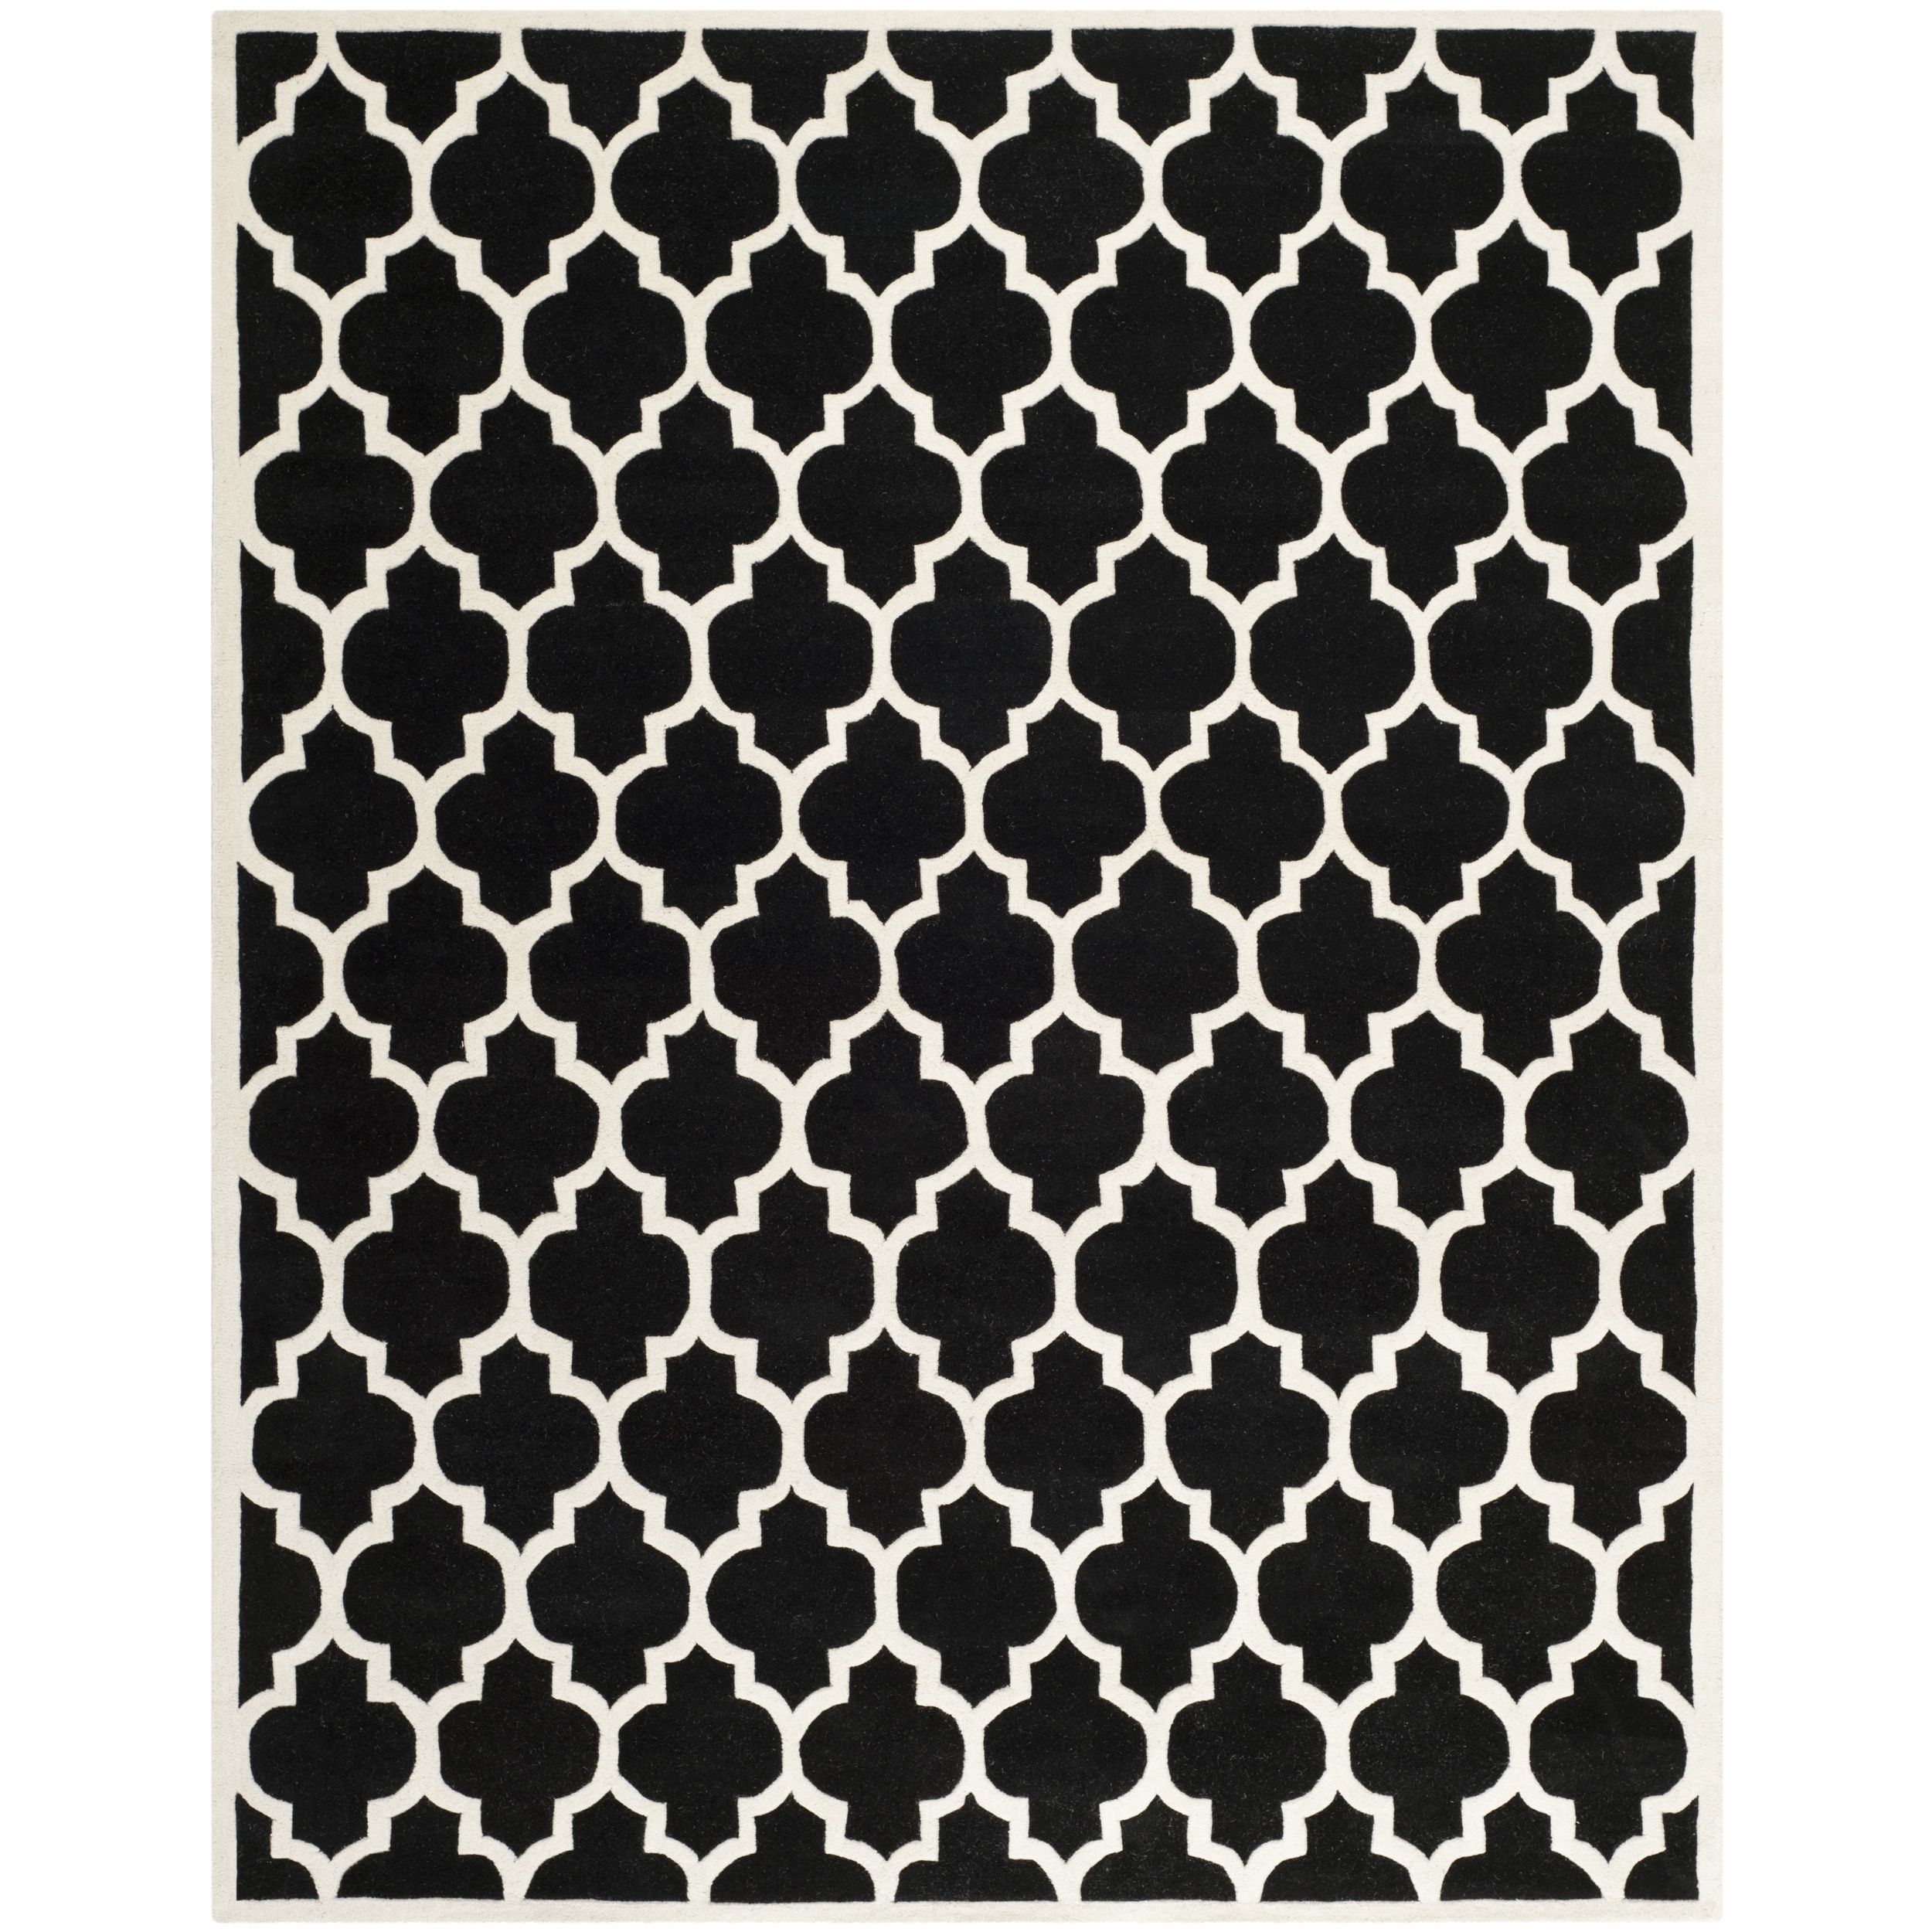 Safavieh Handmade Moroccan Rectangular Black Wool Rug (8' x 10') (CHT734K-8), Size 8' x 10' (Cotton, Geometric)